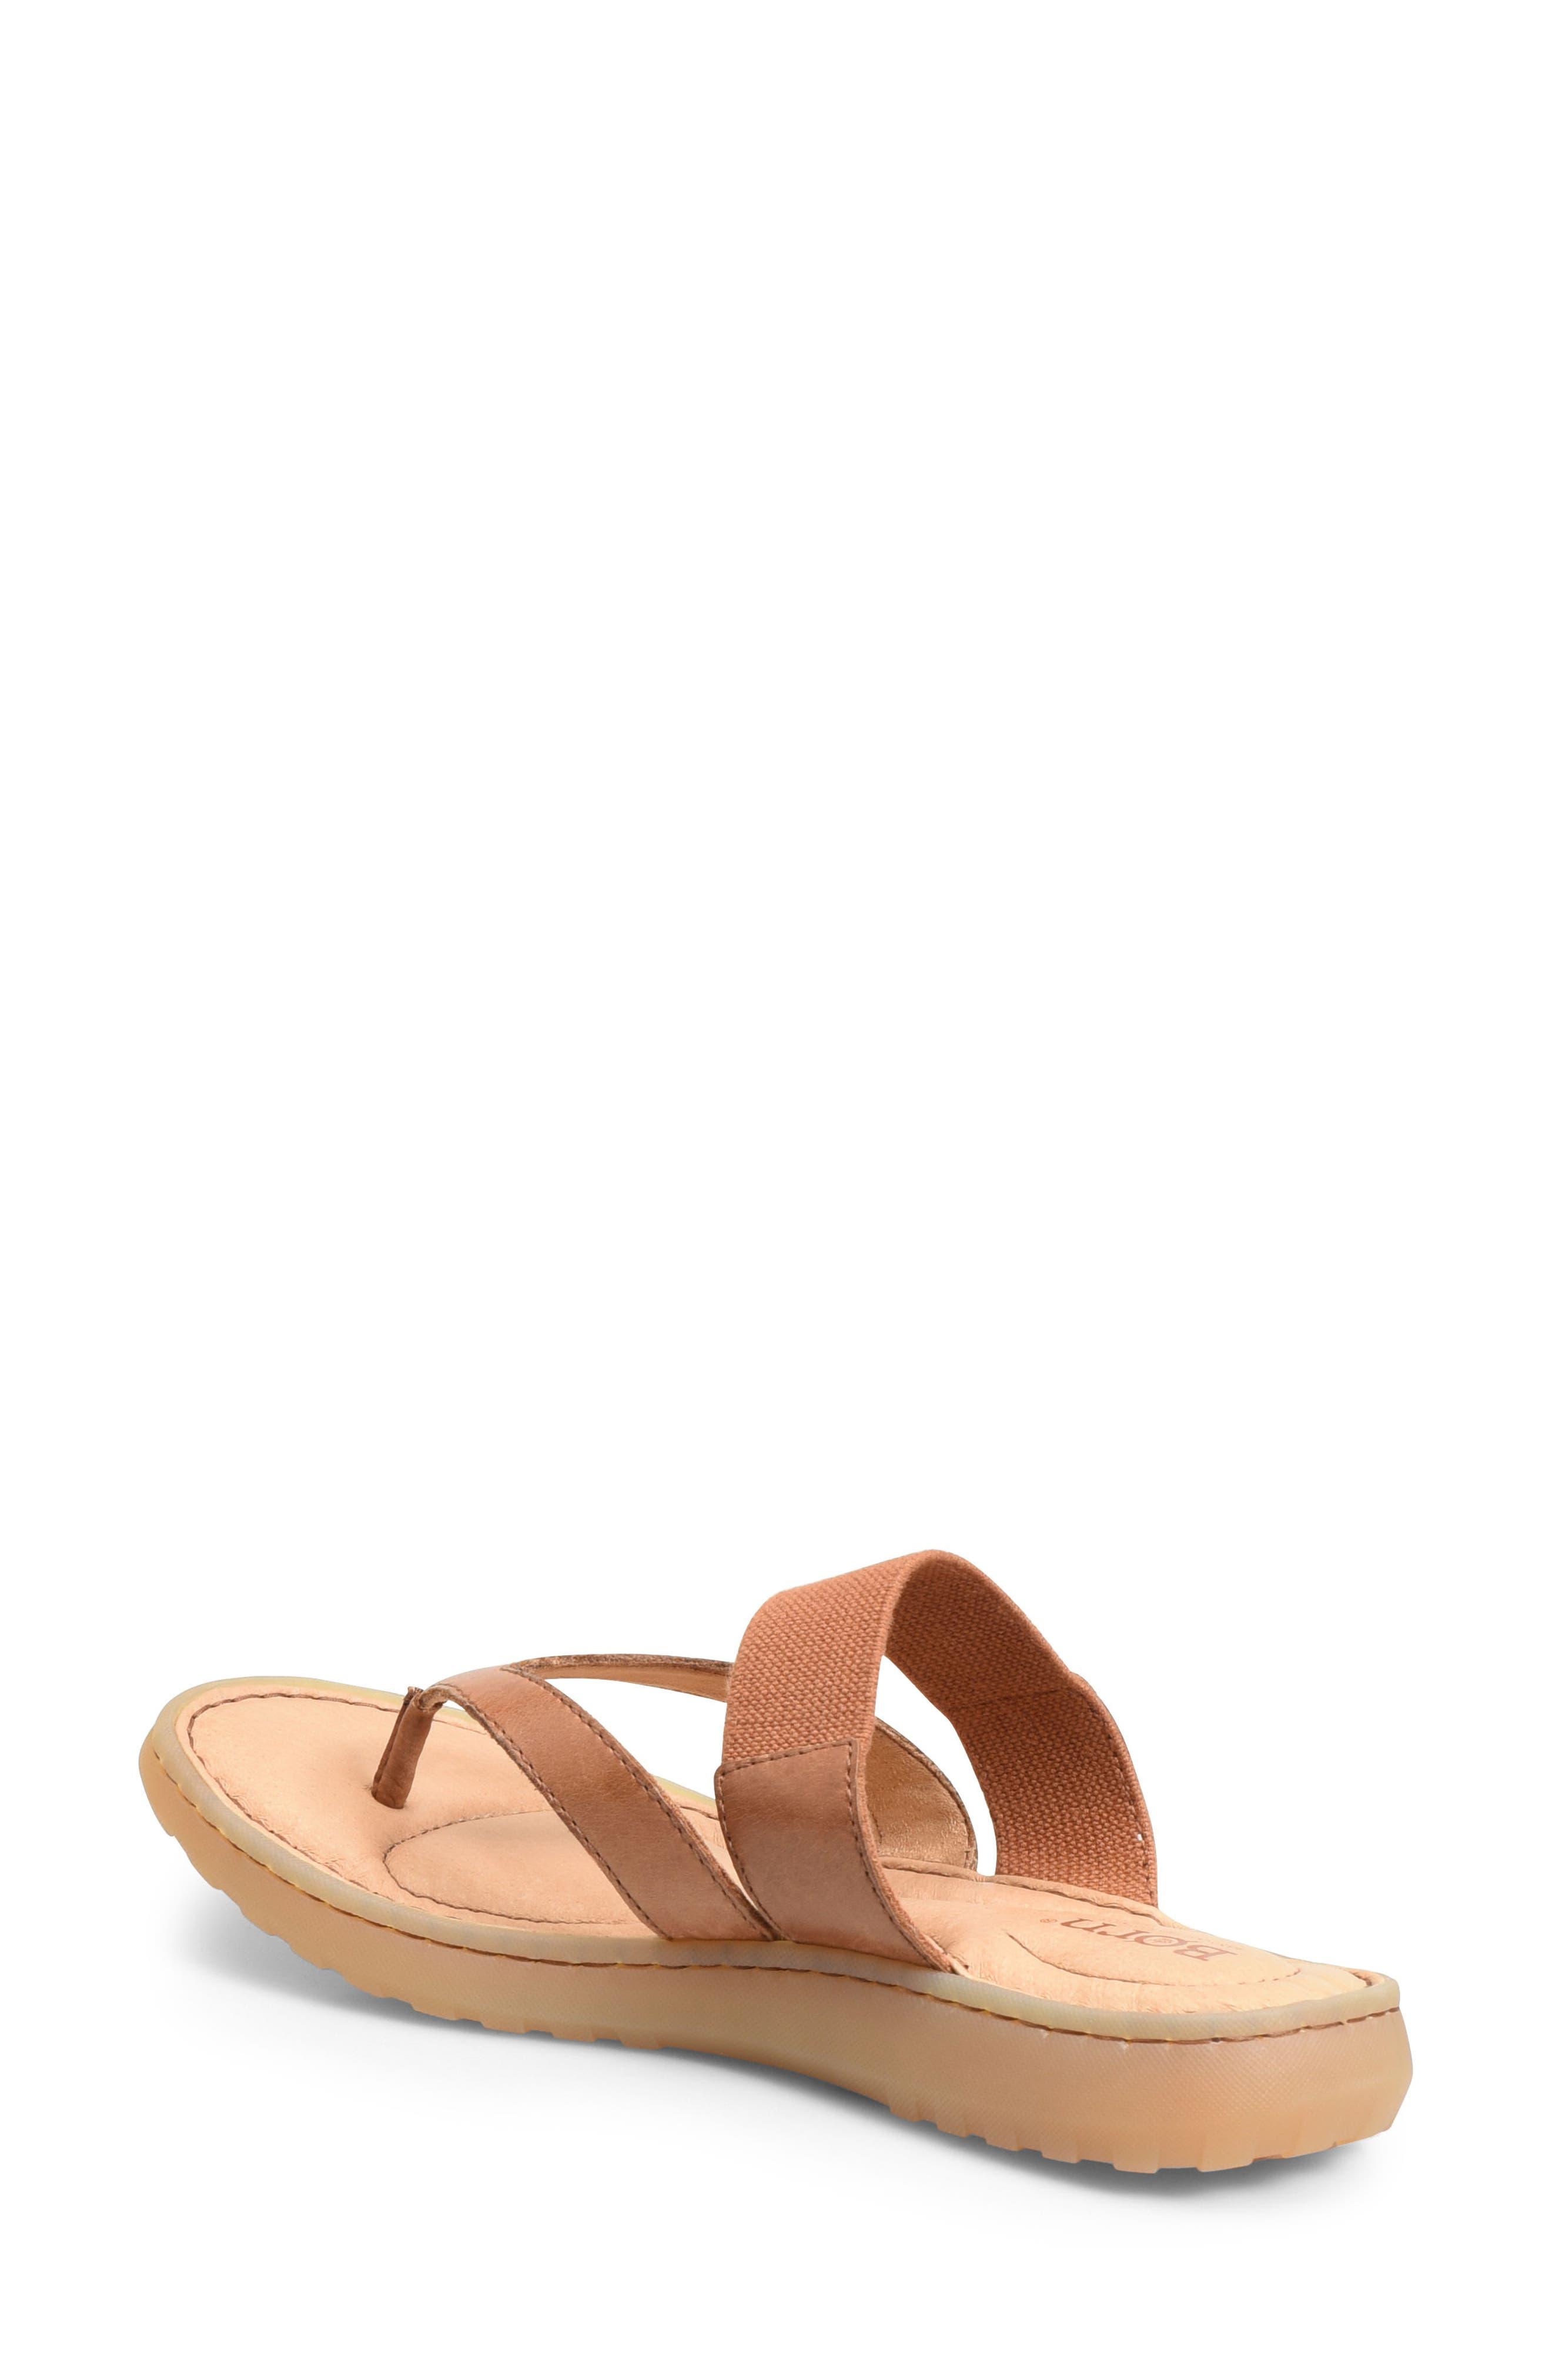 Nevis Sandal,                             Alternate thumbnail 2, color,                             Brown Leather